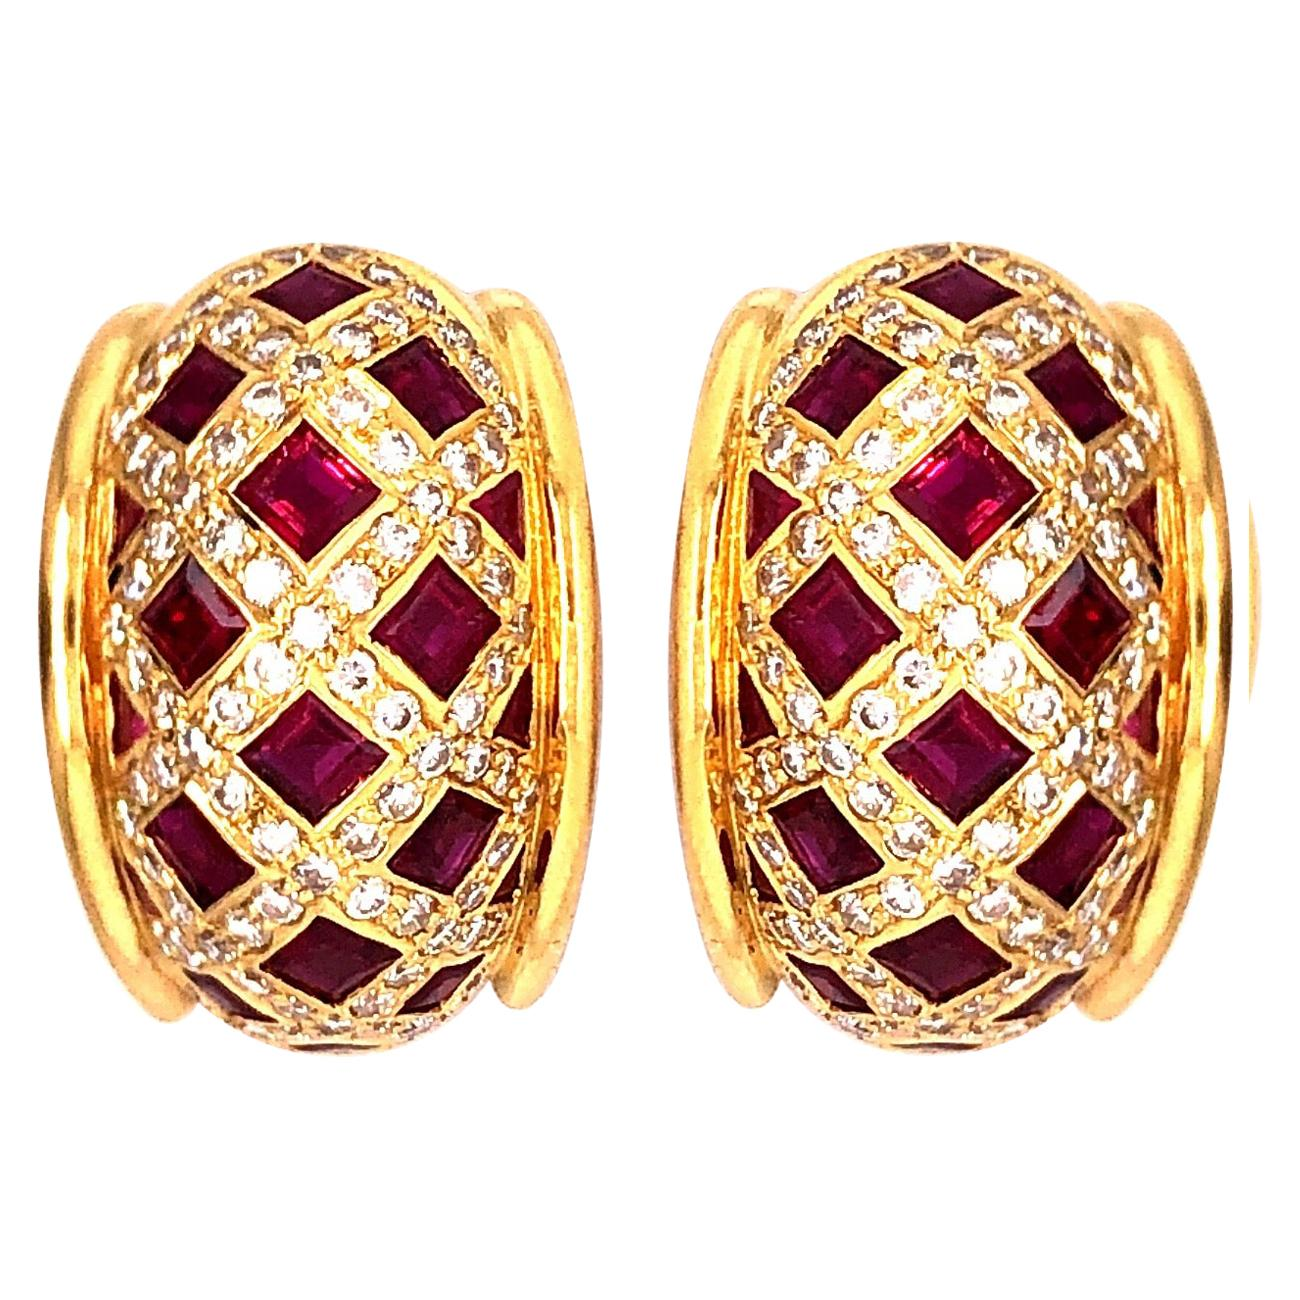 Tiffany & Co. Ruby and Diamond Earrings